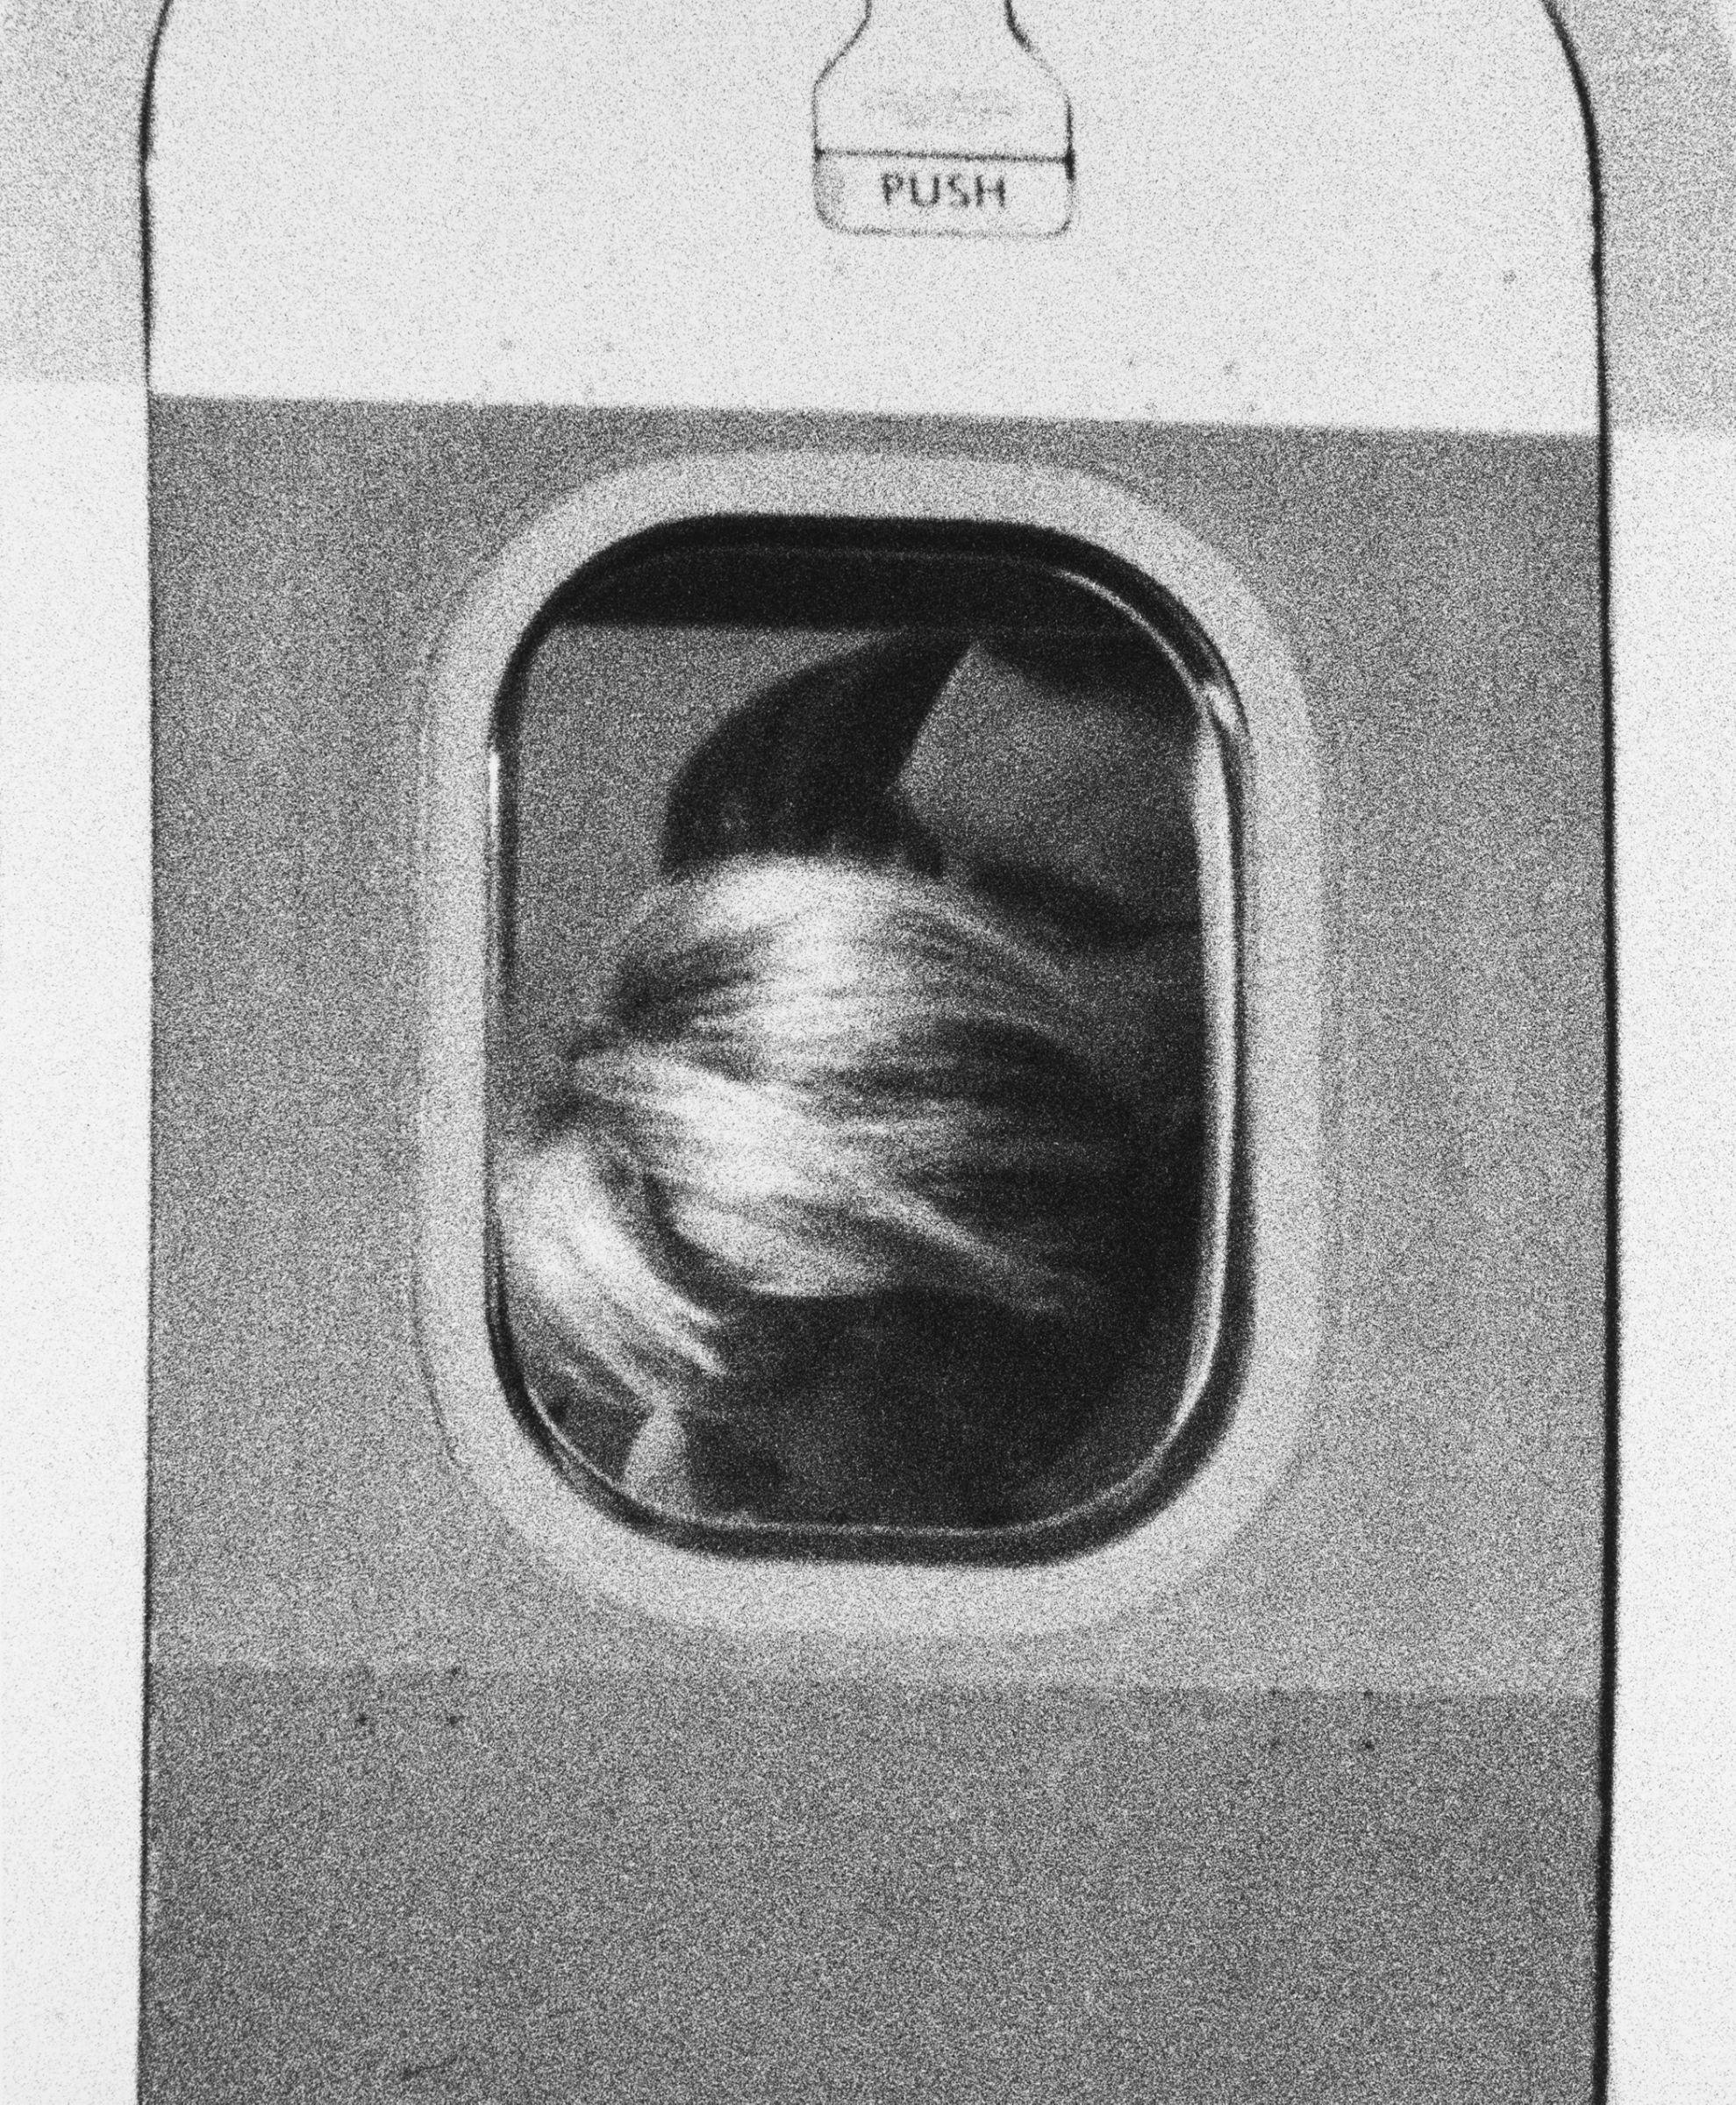 John Schabel, American, Untitled (Passenger #9), 1995. Gelatin silver print. Harvard Art Museums/Fogg Museum, Schneider/Erdman Printer's Proof Collection, partial gift, and partial purchase through the Margaret Fisher Fund, 2011.424.